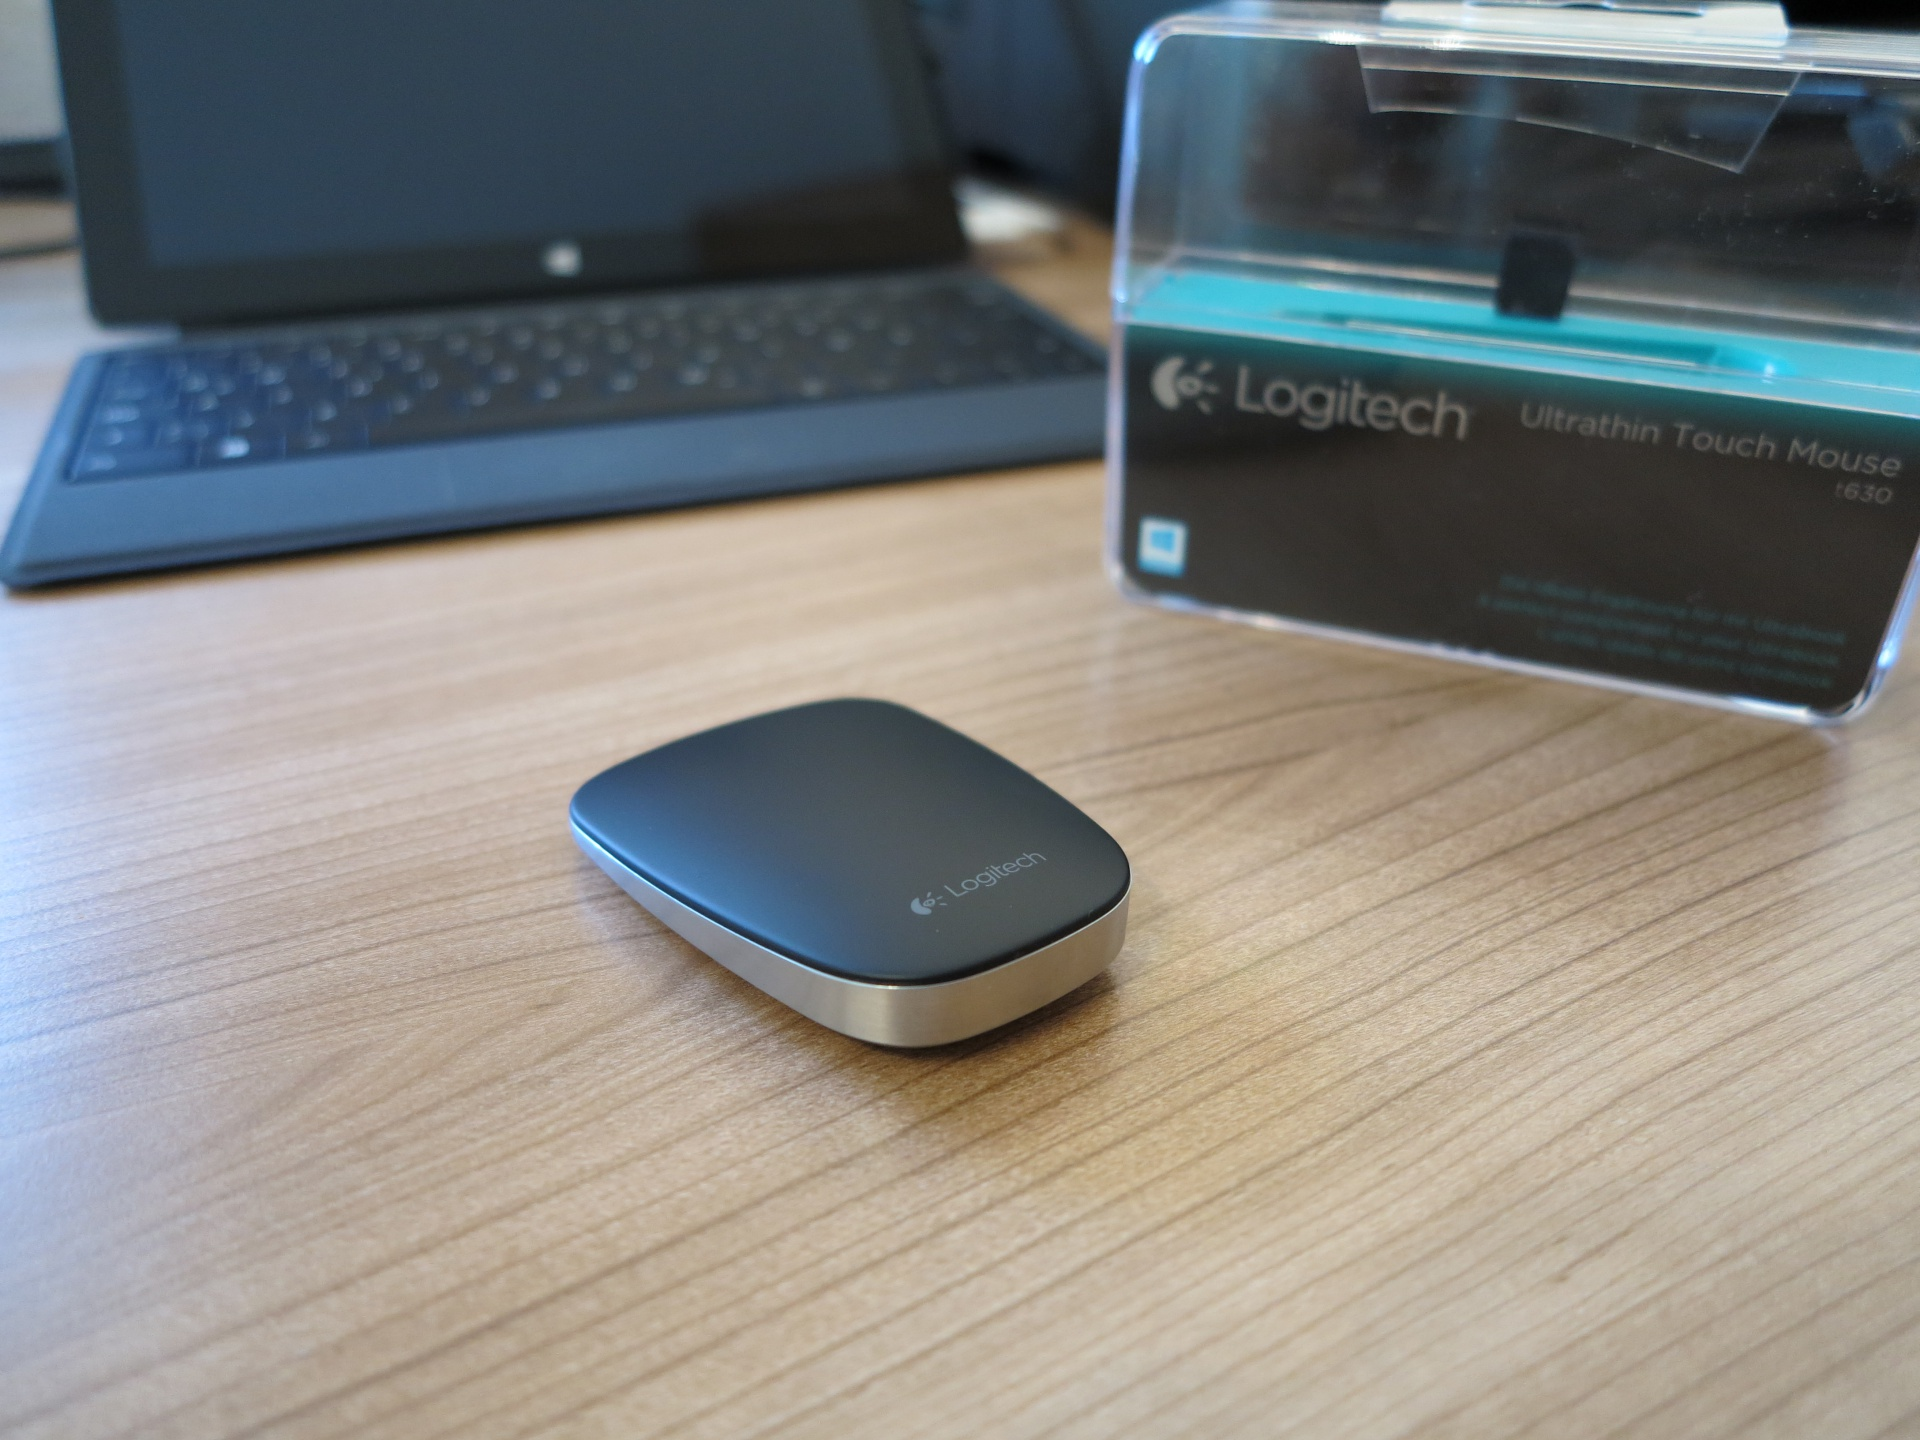 Logitech – Ultrathin Touch Mouse t630 ruckelt